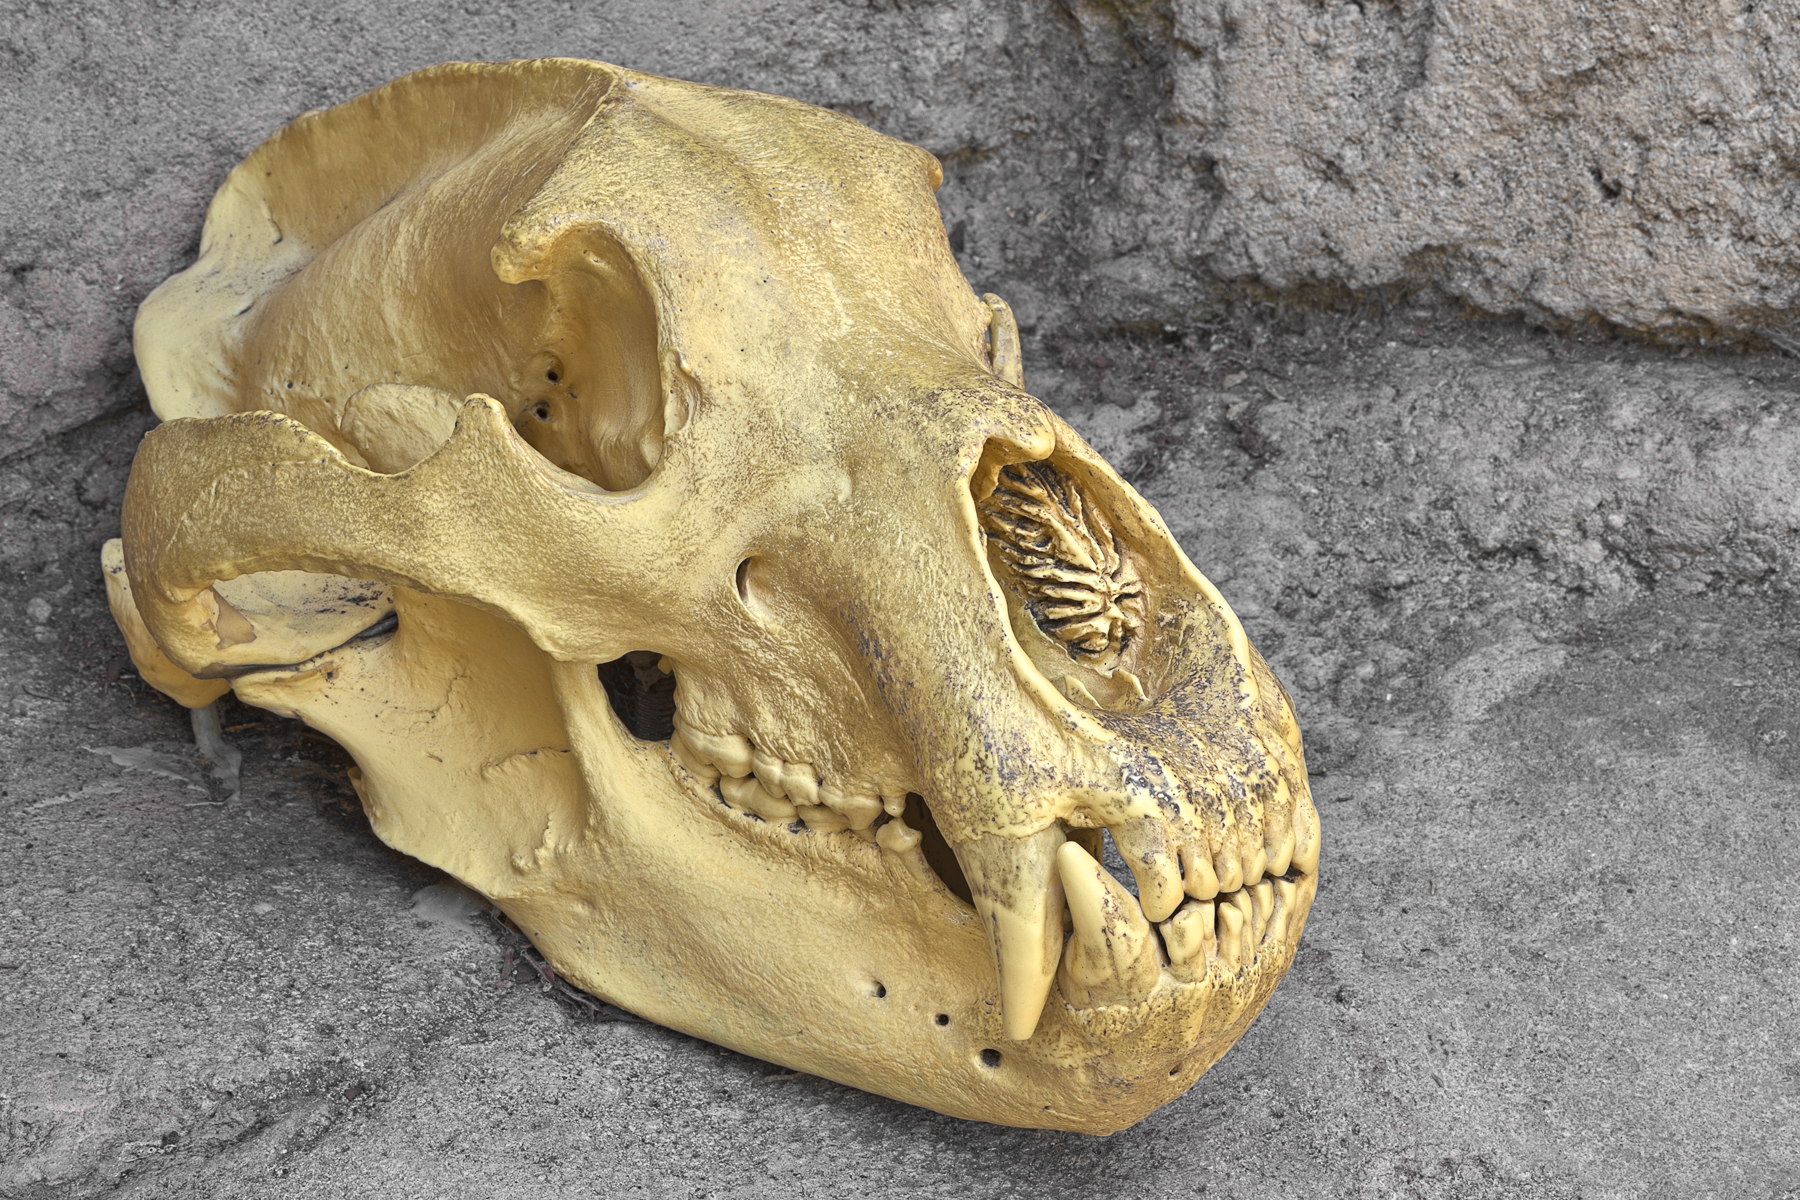 Bear Skull Close-up - HDR, Anatomical, Object, Raw, Range, HQ Photo